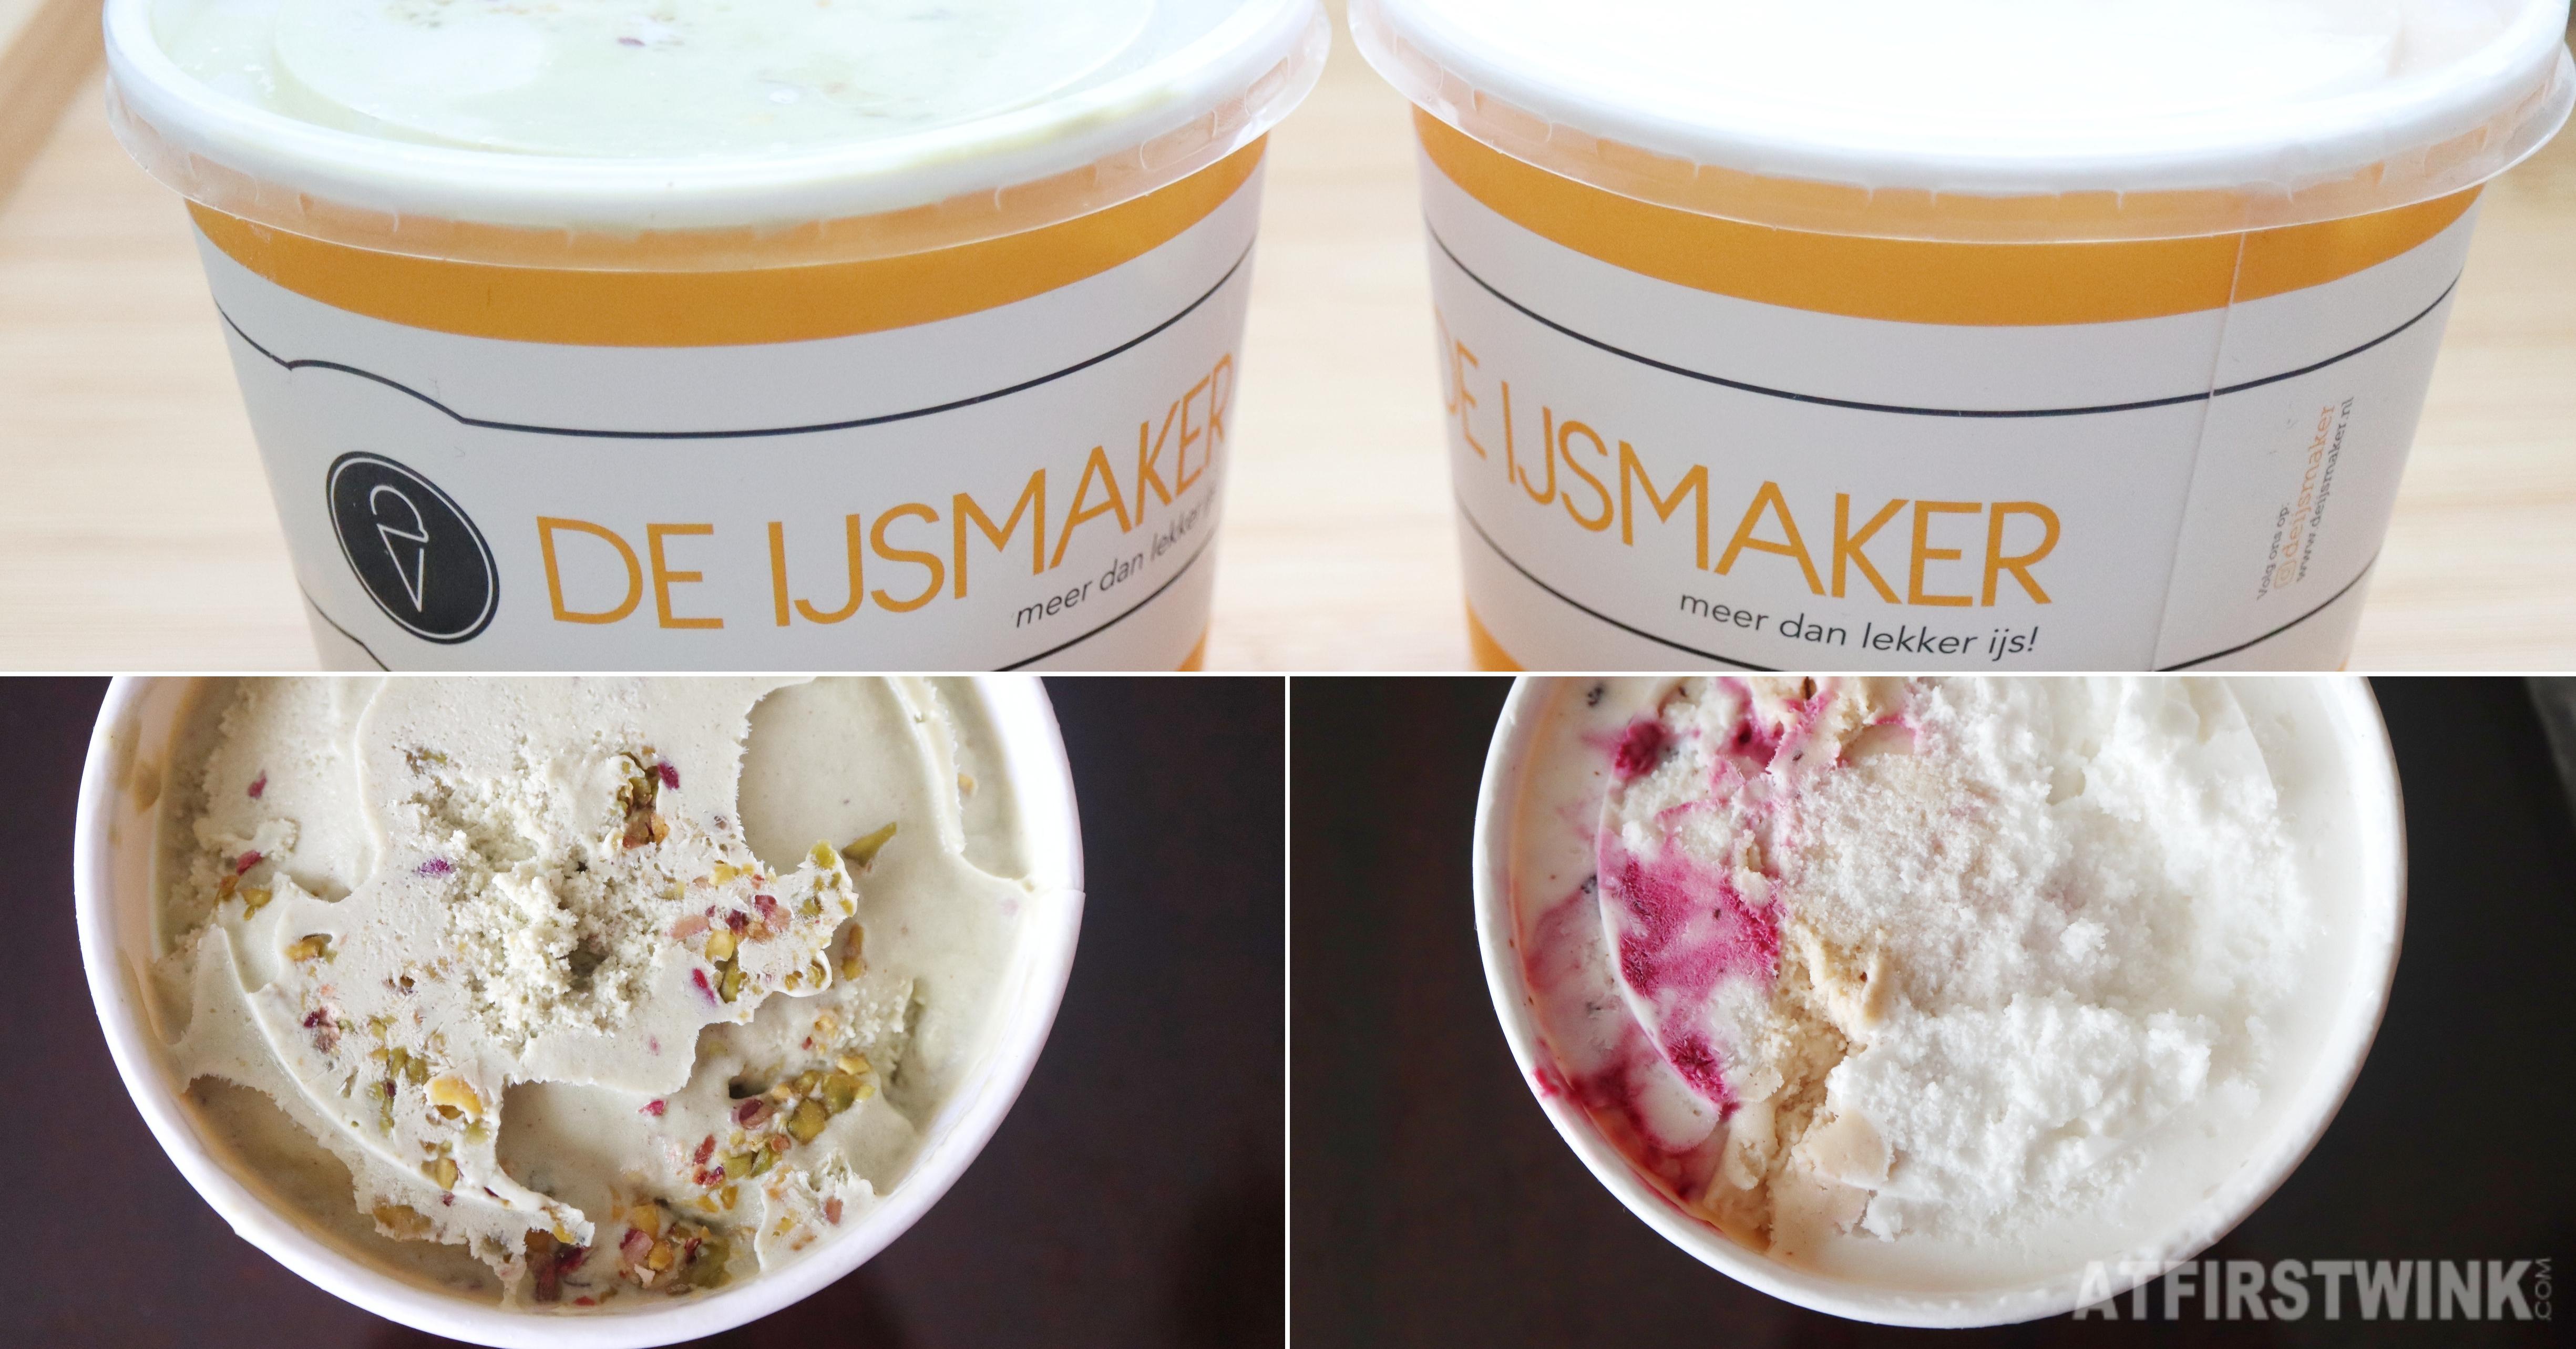 De IJsmaker Rotterdam ice cream takeout pints